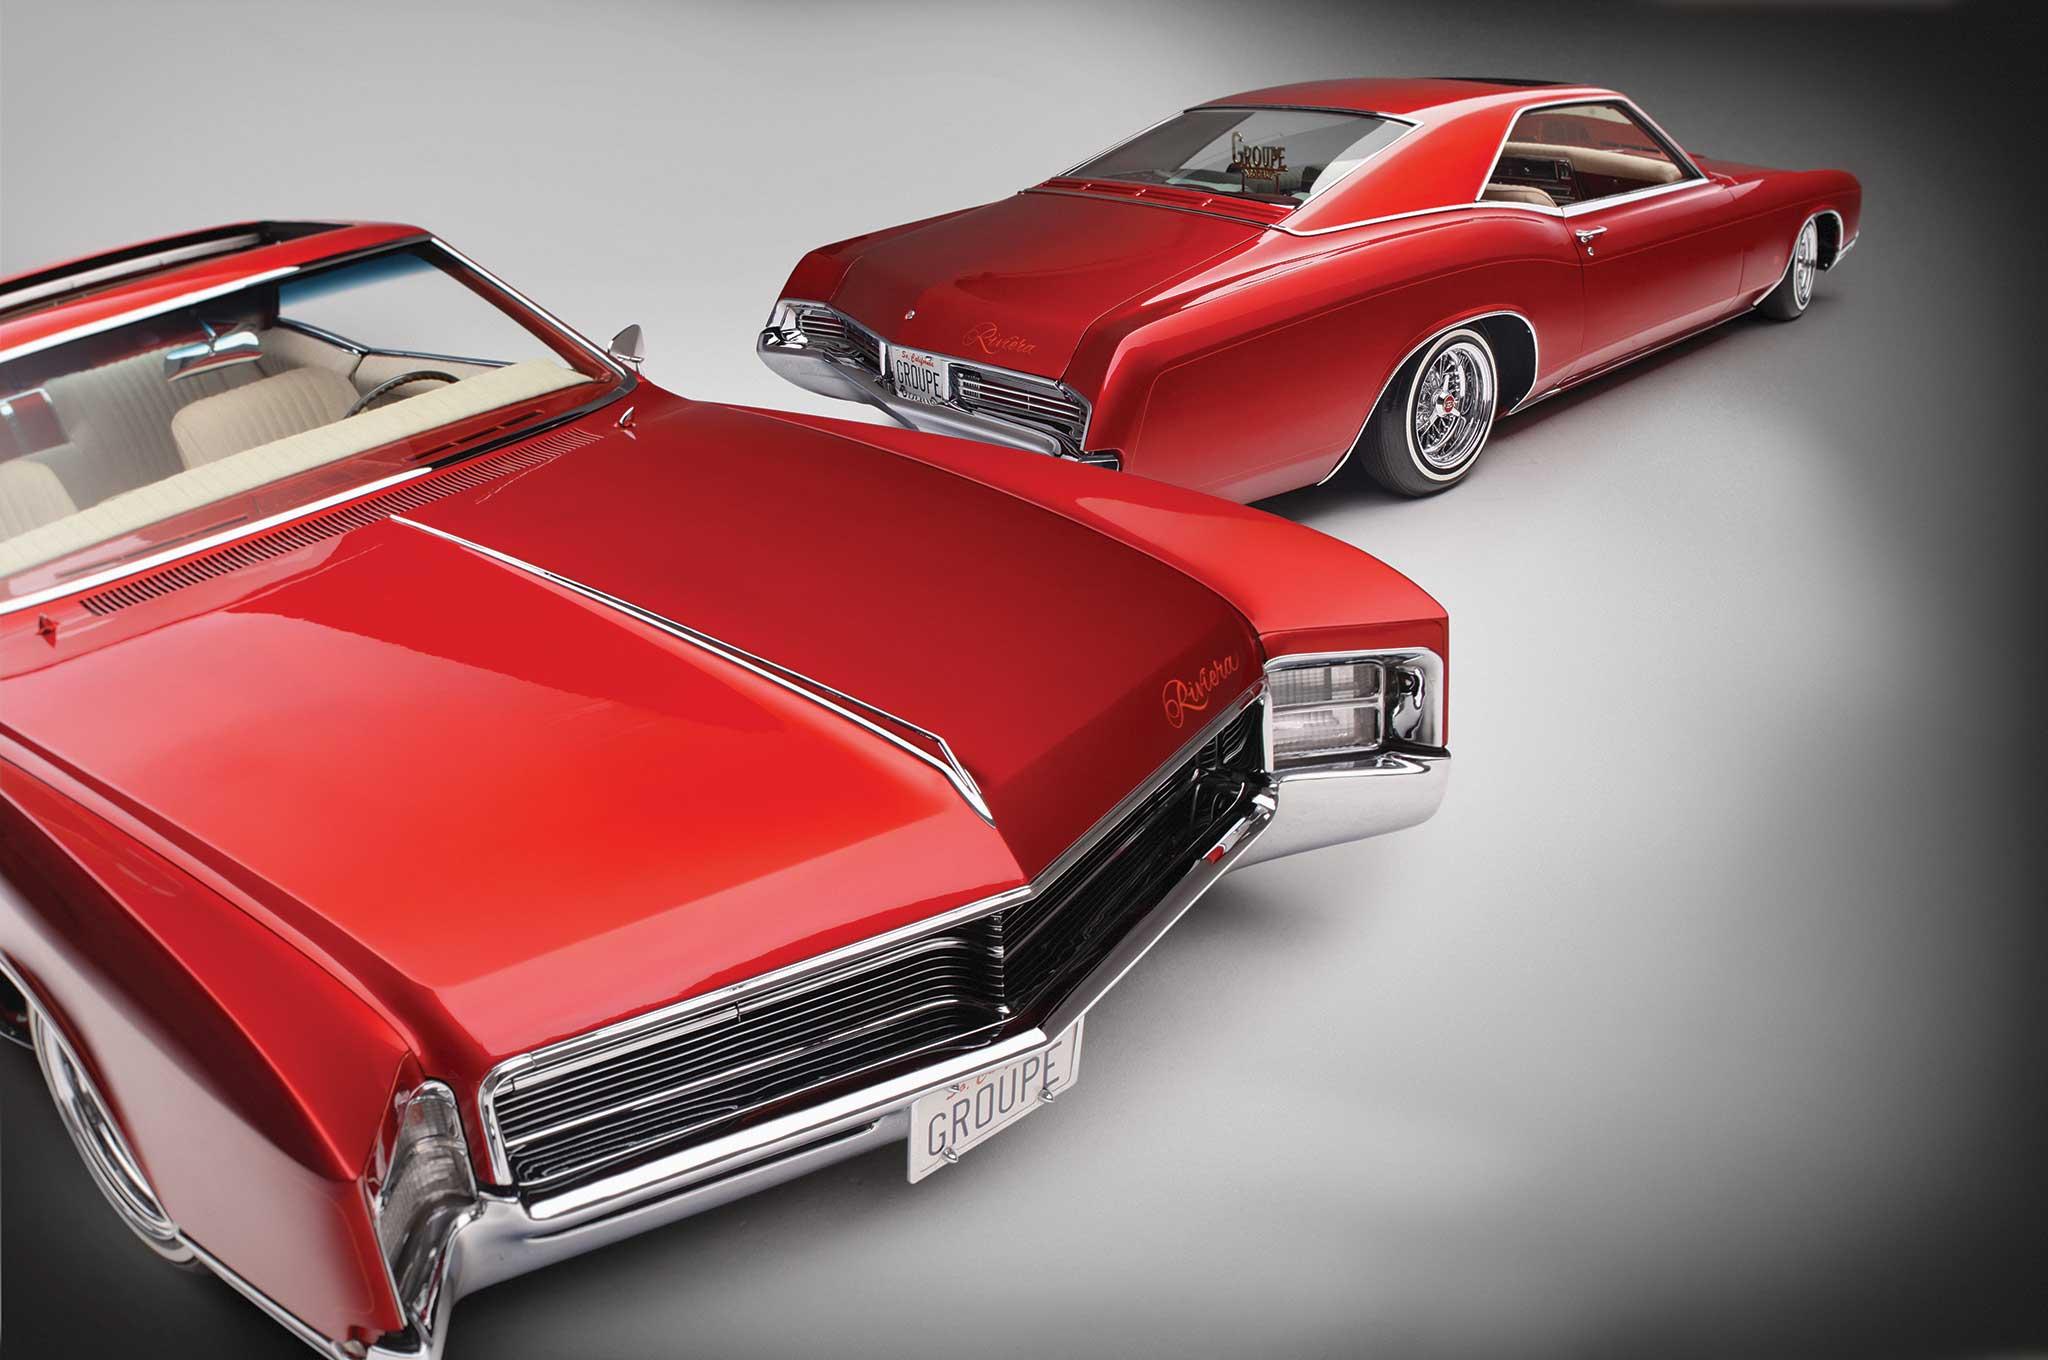 1967 buick riviera achilles last stand 001